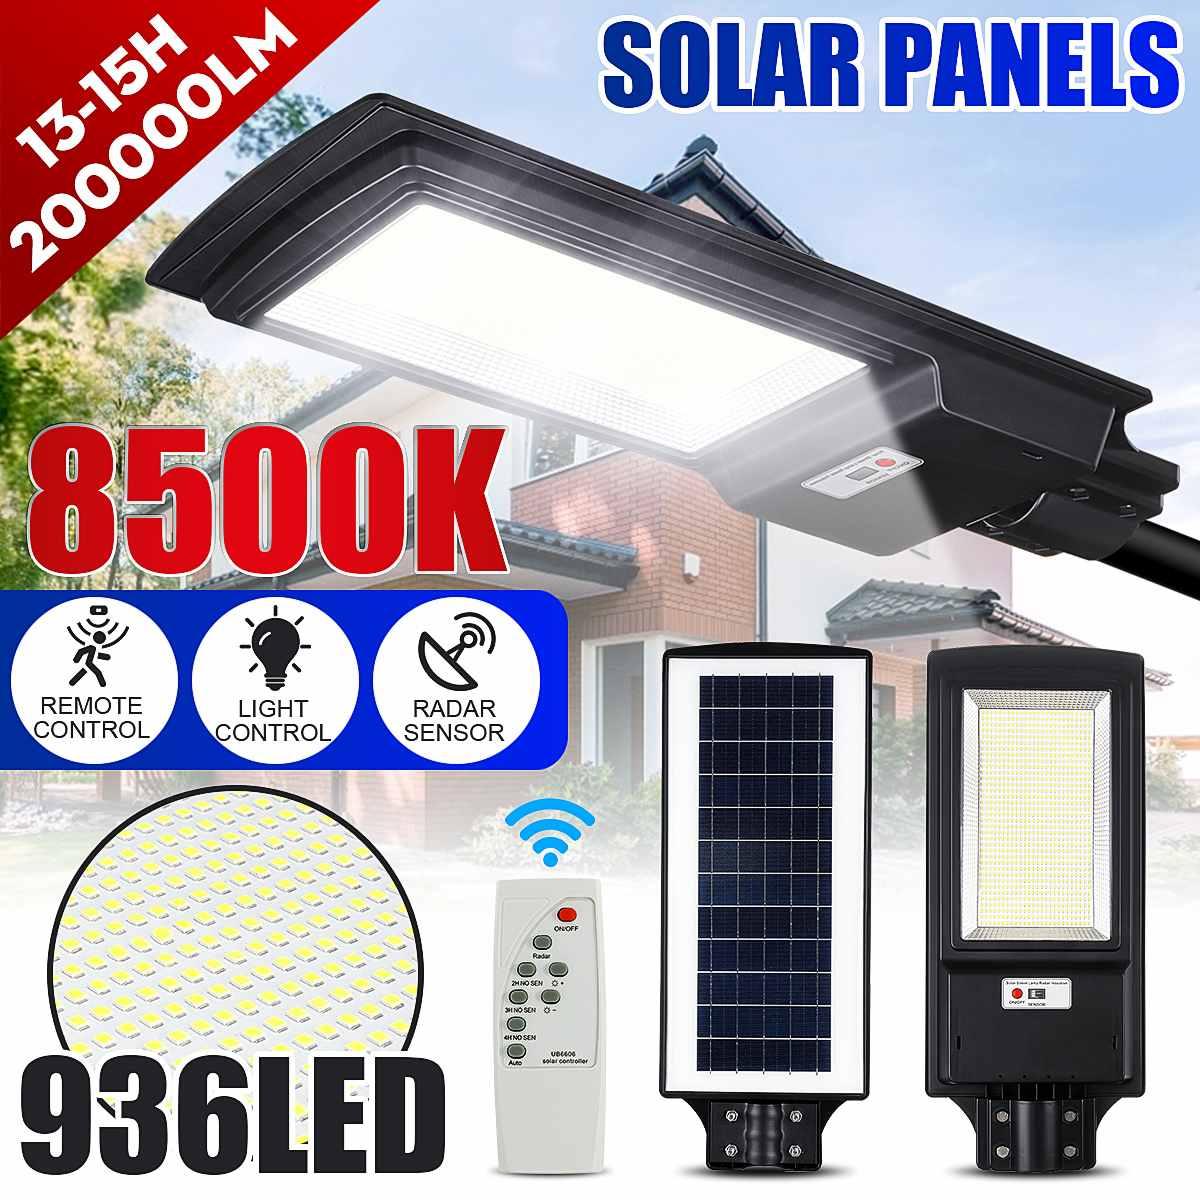 150W 300W LED Solar Street Light 2835smd Radar Sensor Super Bright 436led/936led Solar Lamp For Plaza And Pathway 5000-6000K